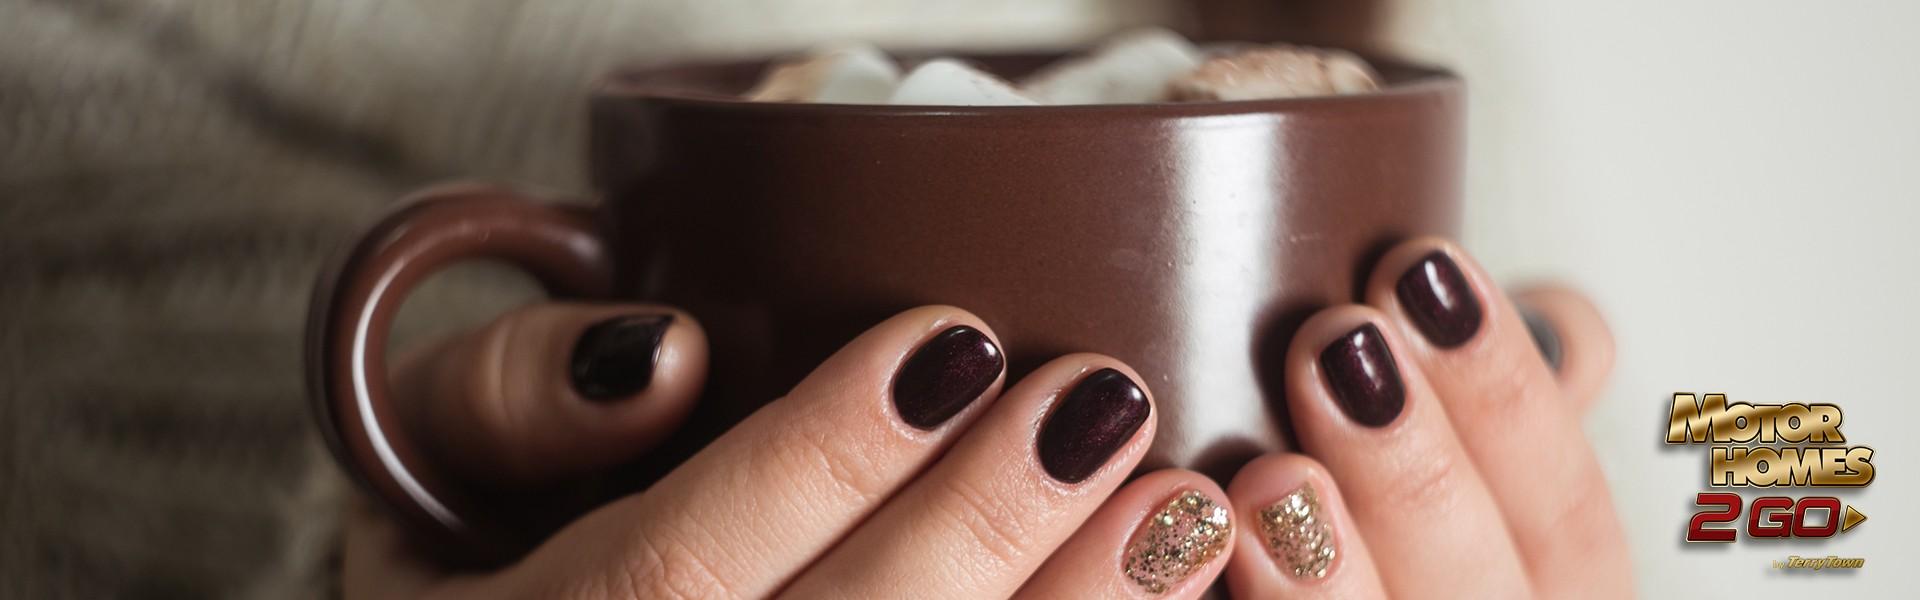 Girl with holiday nail polish holding hot chocolate